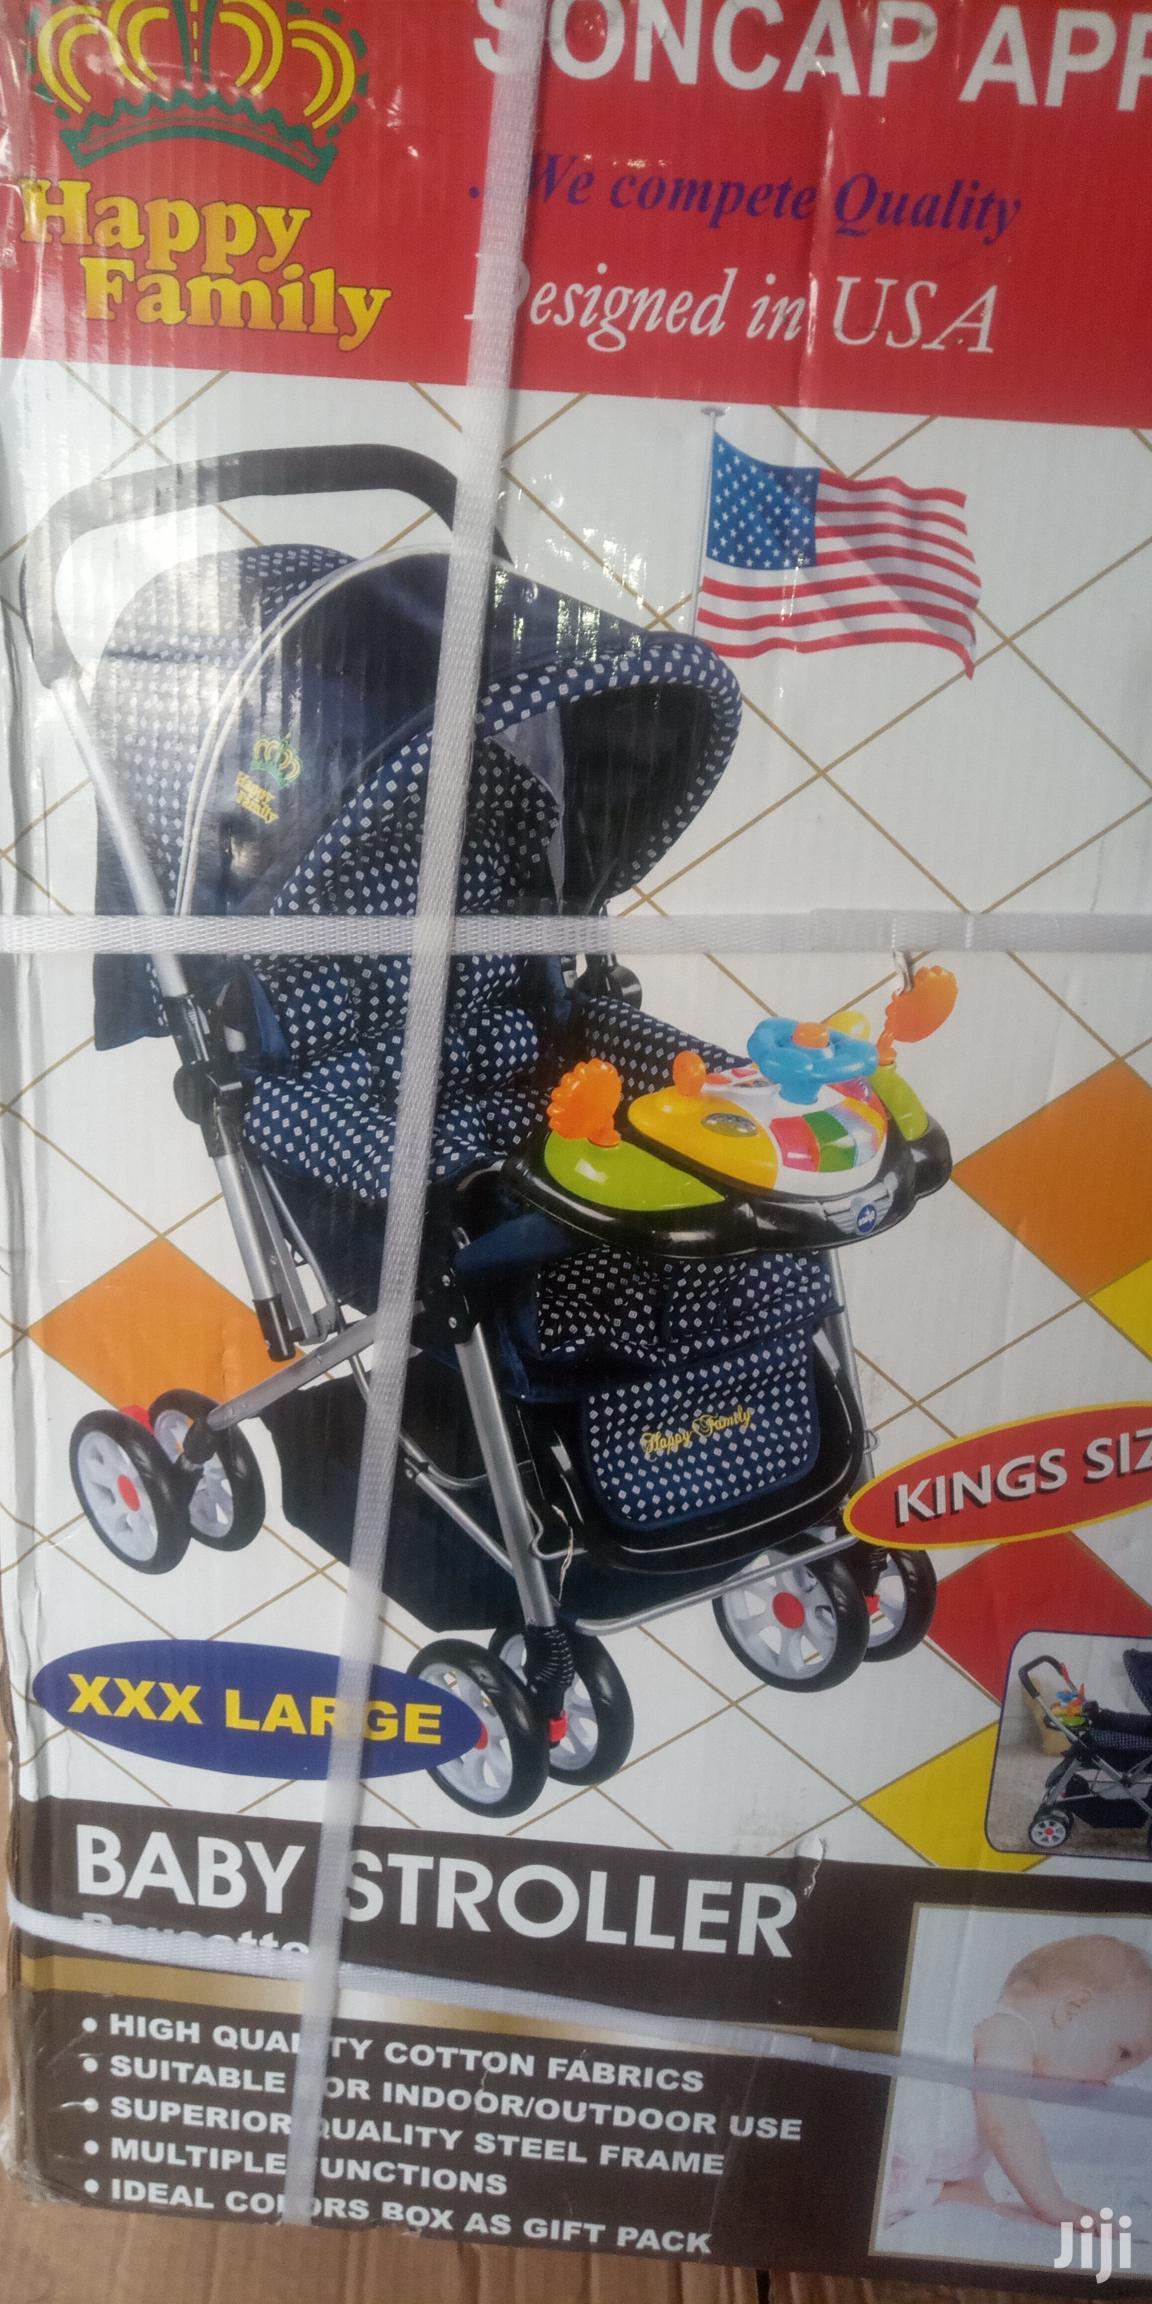 Archive: Happy Family 3 -in -1 Baby Stroller (Xxl Size) - Kingsize